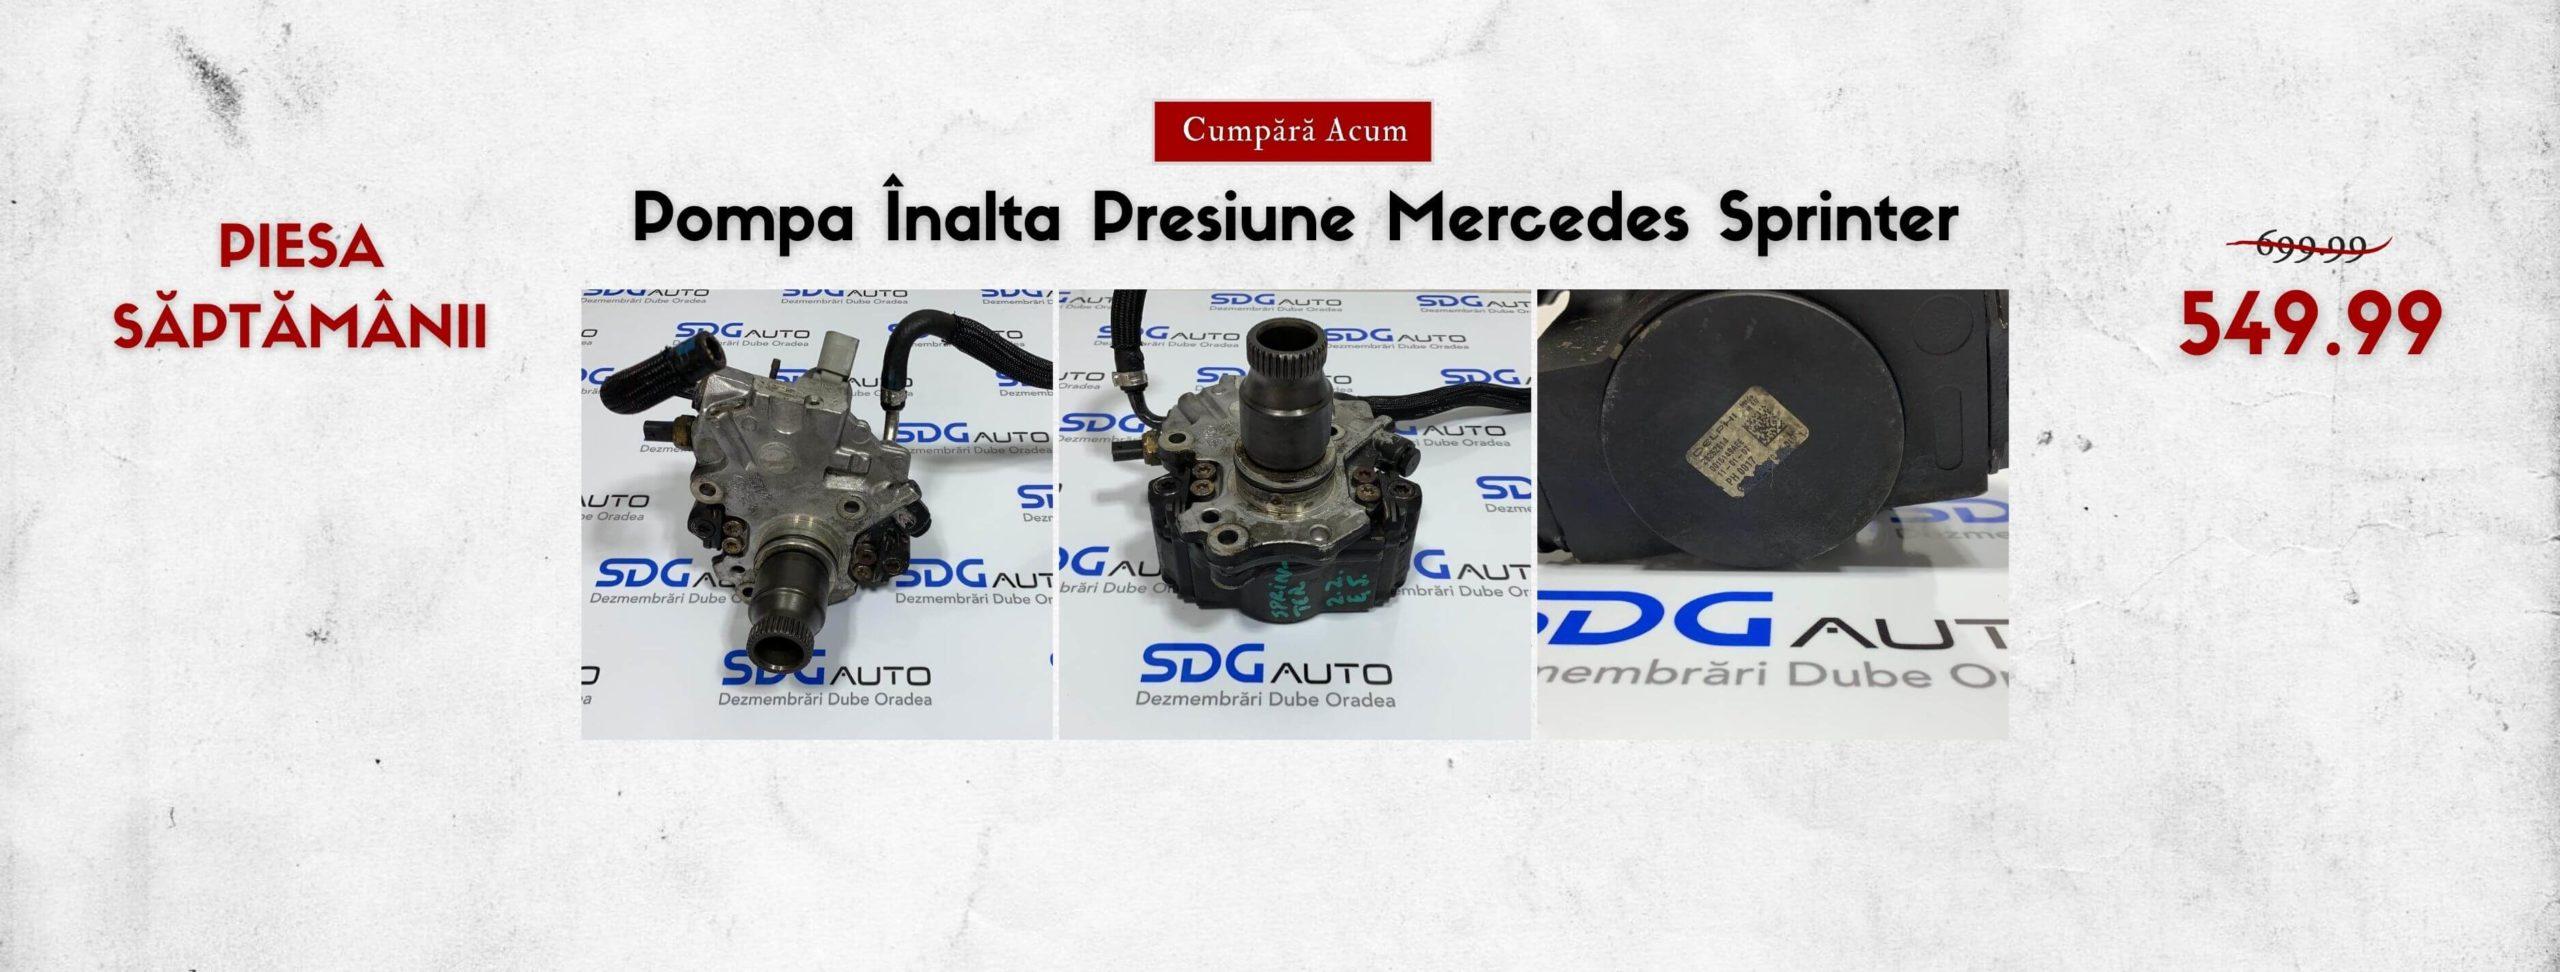 https://www.sdgauto.ro/app/uploads/2020/09/Pompa-Înalta-Presiune-Mercedes-Sprinter-scaled.jpg